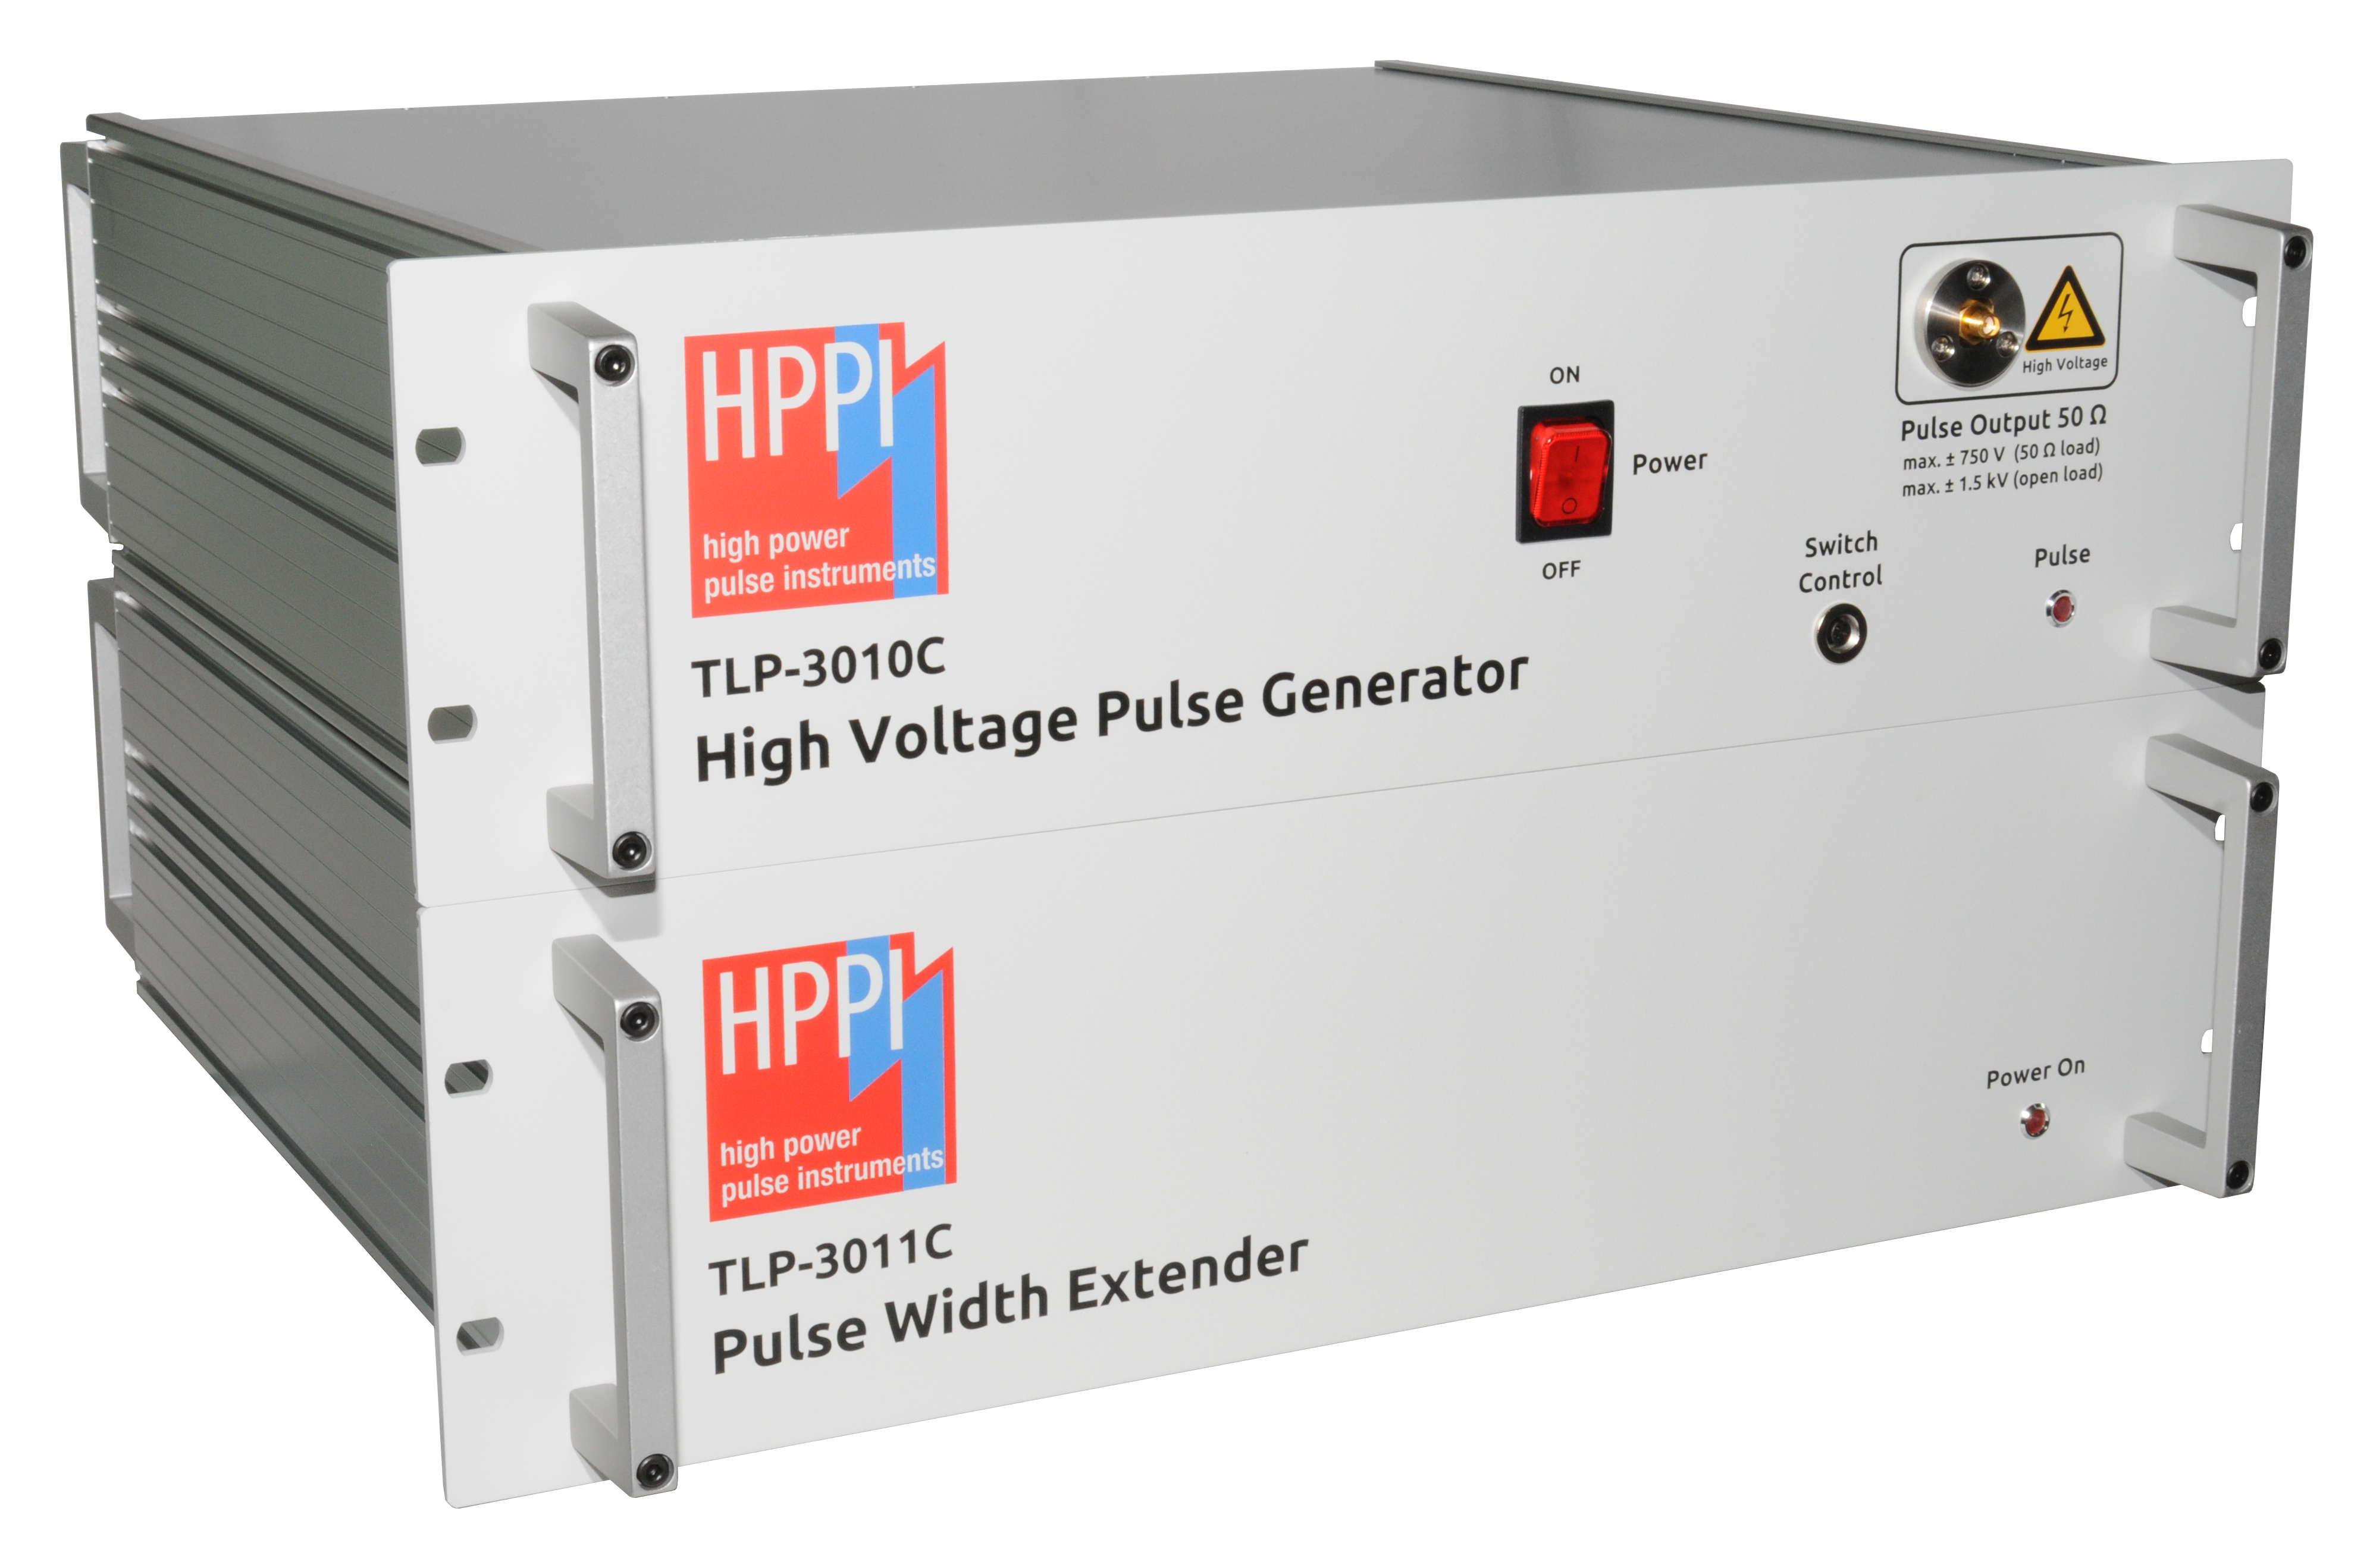 TLP 3010C – High Power Pulse Instruments GmbH